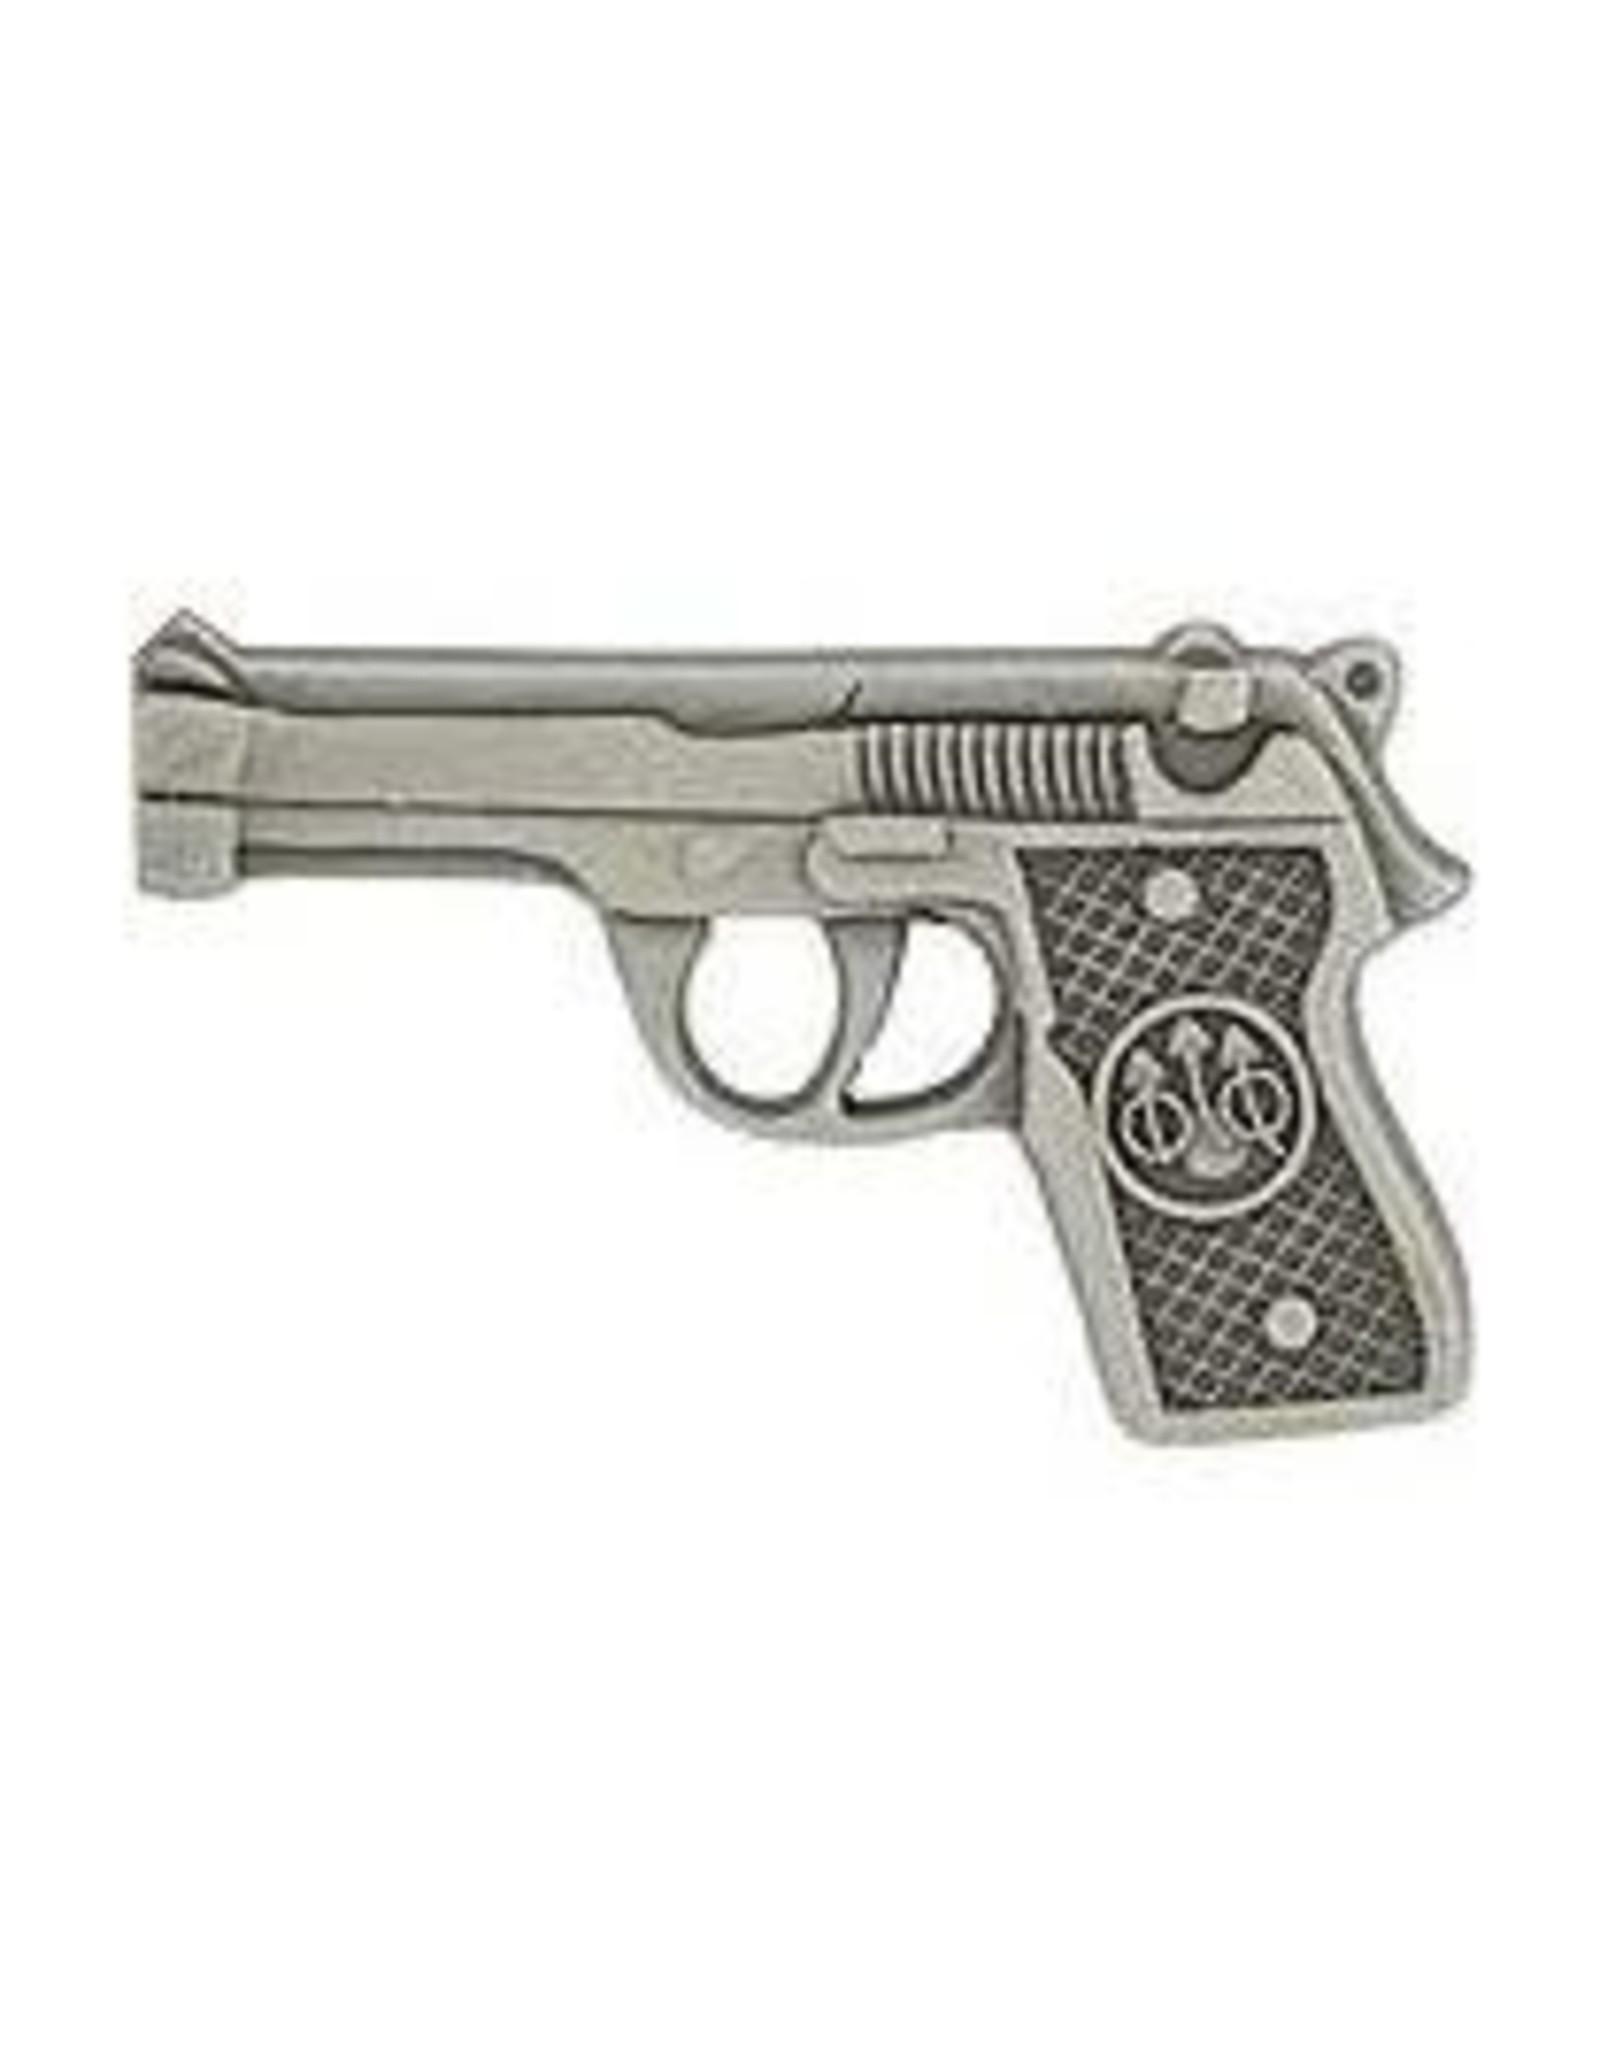 Pin - 45Cal Pistol Silver Model 1911